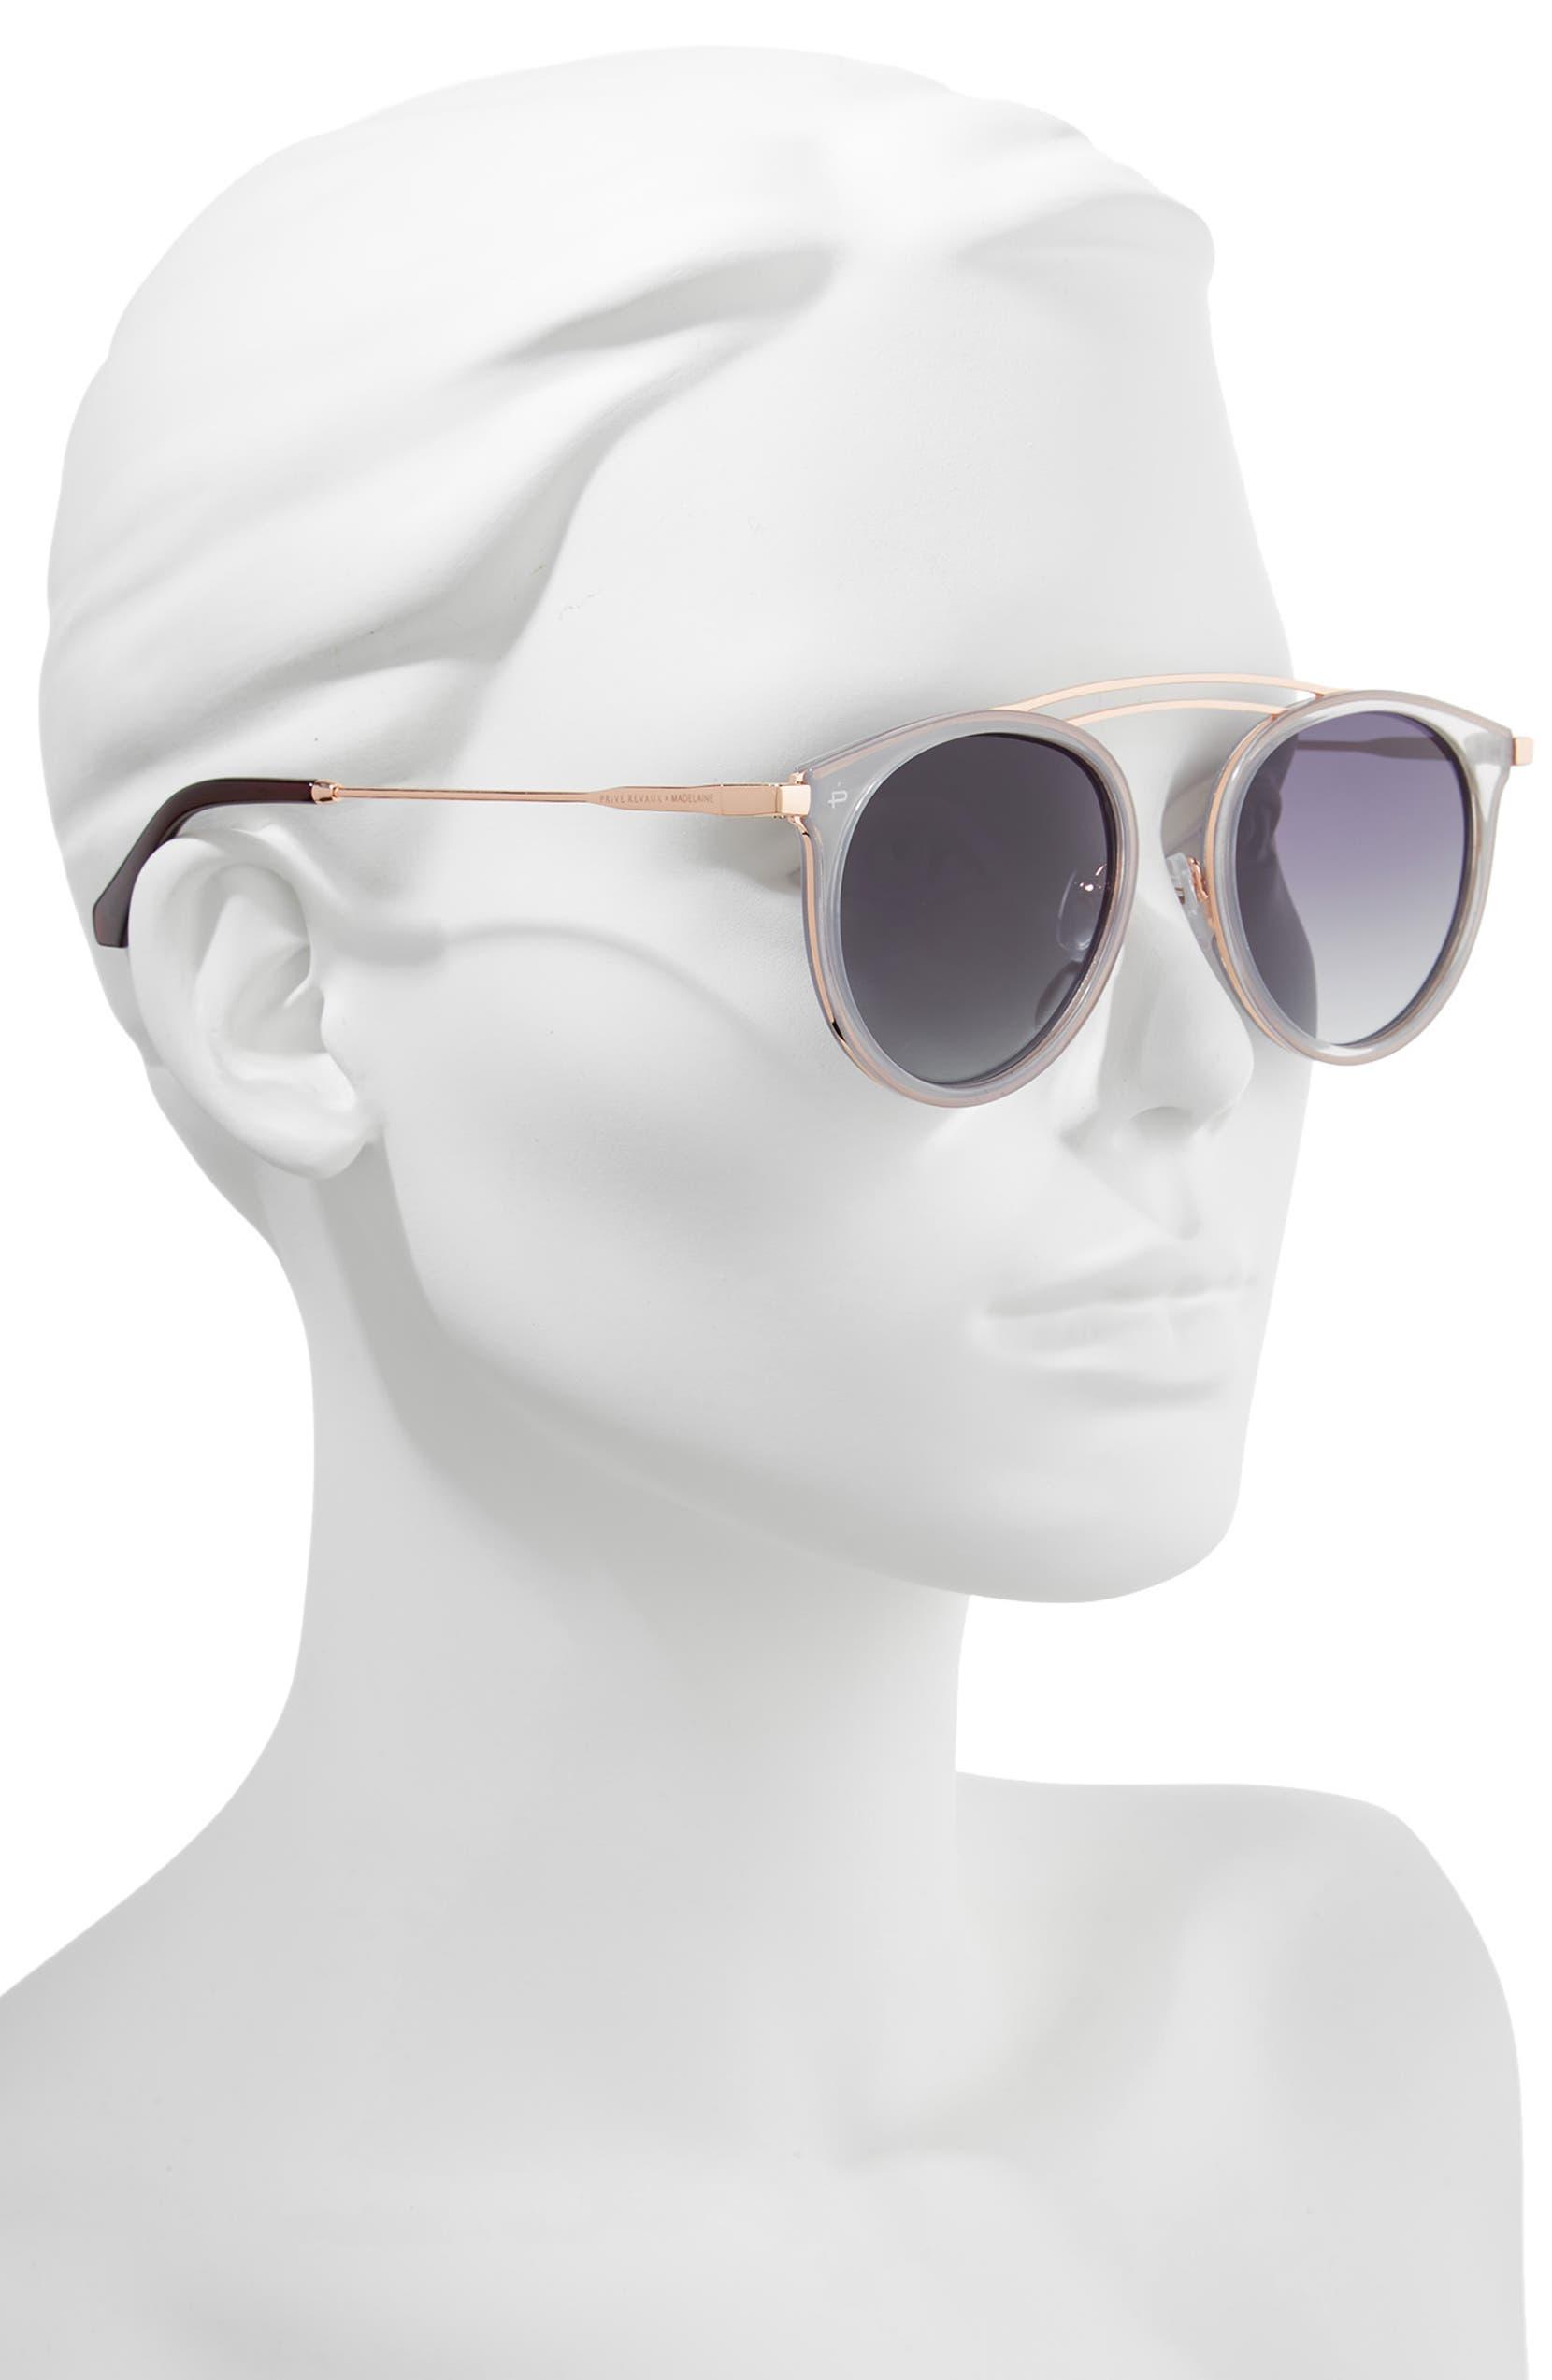 078f3318dc Privé Revaux x Madelaine Petsch The Rogue 50mm Sunglasses